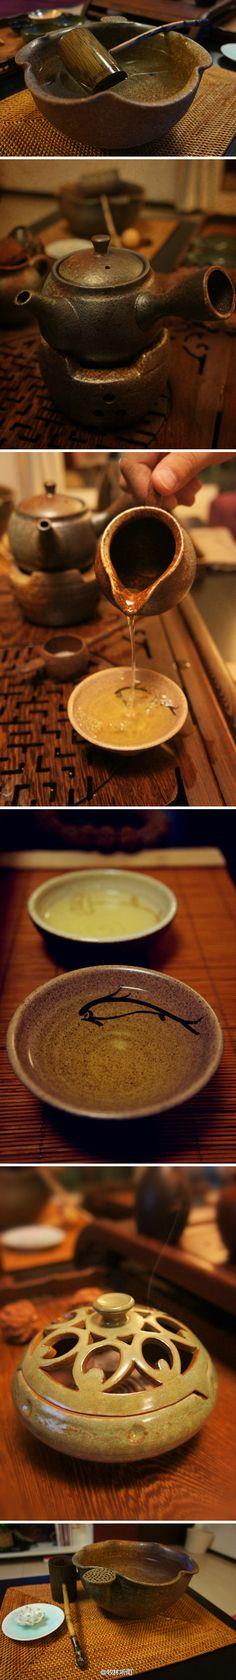 Vietnamese tea Ceremony. Recomended by SenseAsia.net